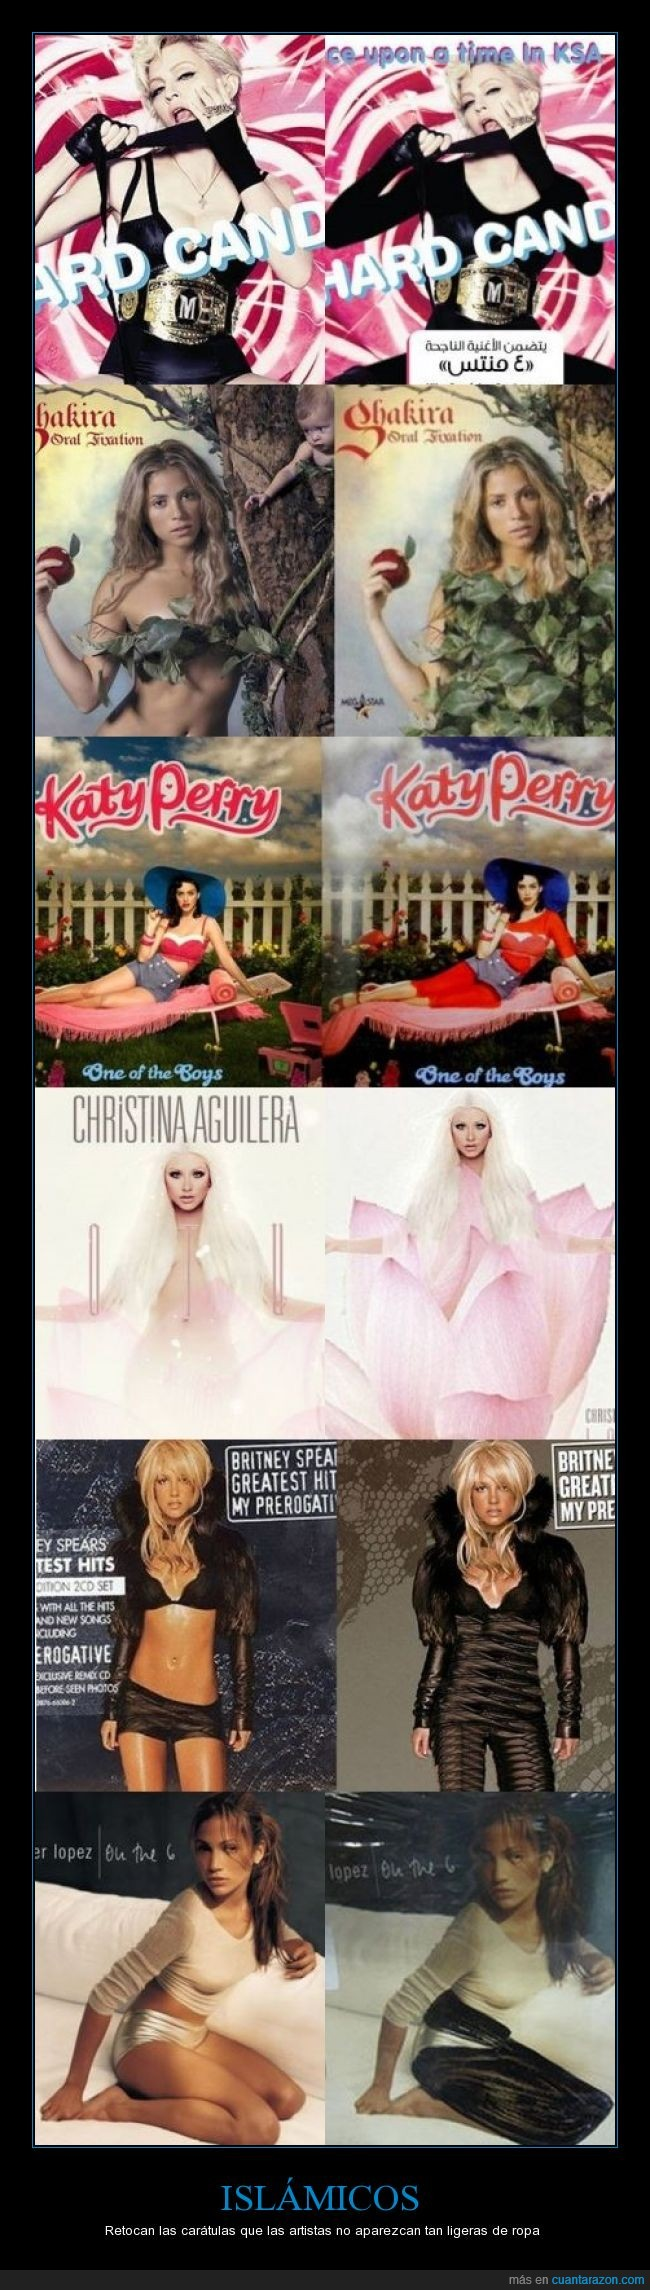 Britney Spears,caratula,carne,CD,Christina Aguilera,islam,islamico,Jennifer Lopez,Katy Perry,Madonna,portada,religion,Shakira,tapada,tapar